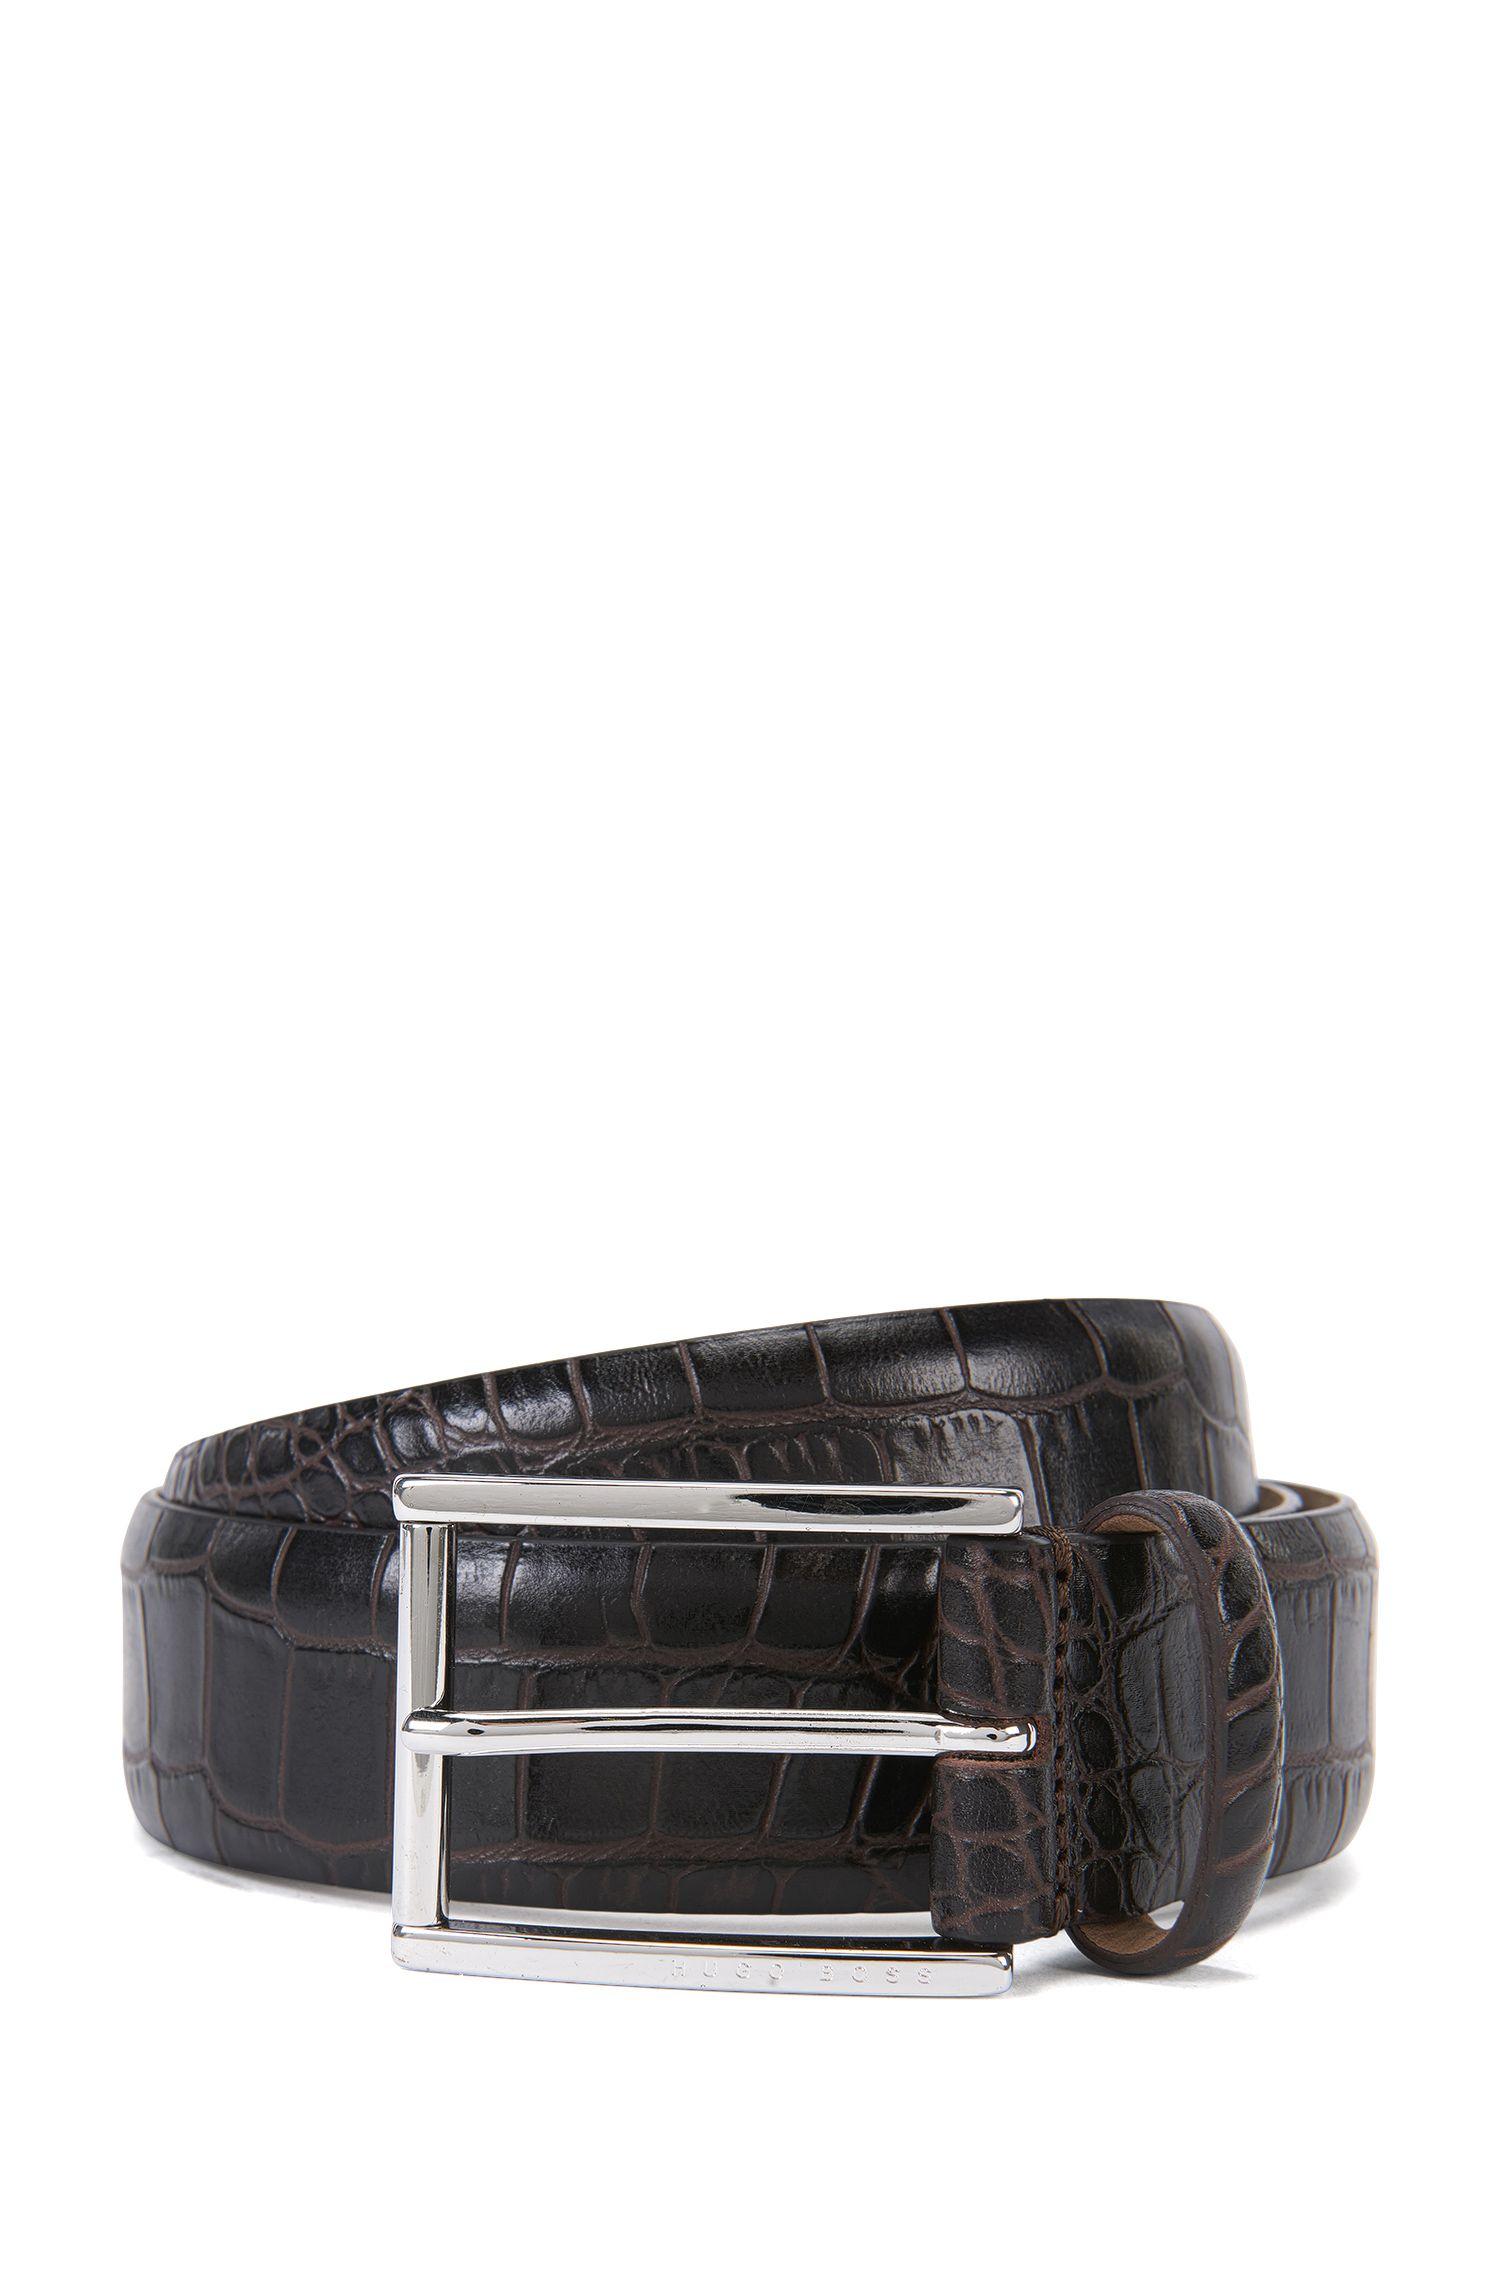 Italian Patent Leather Belt | T-Lelion